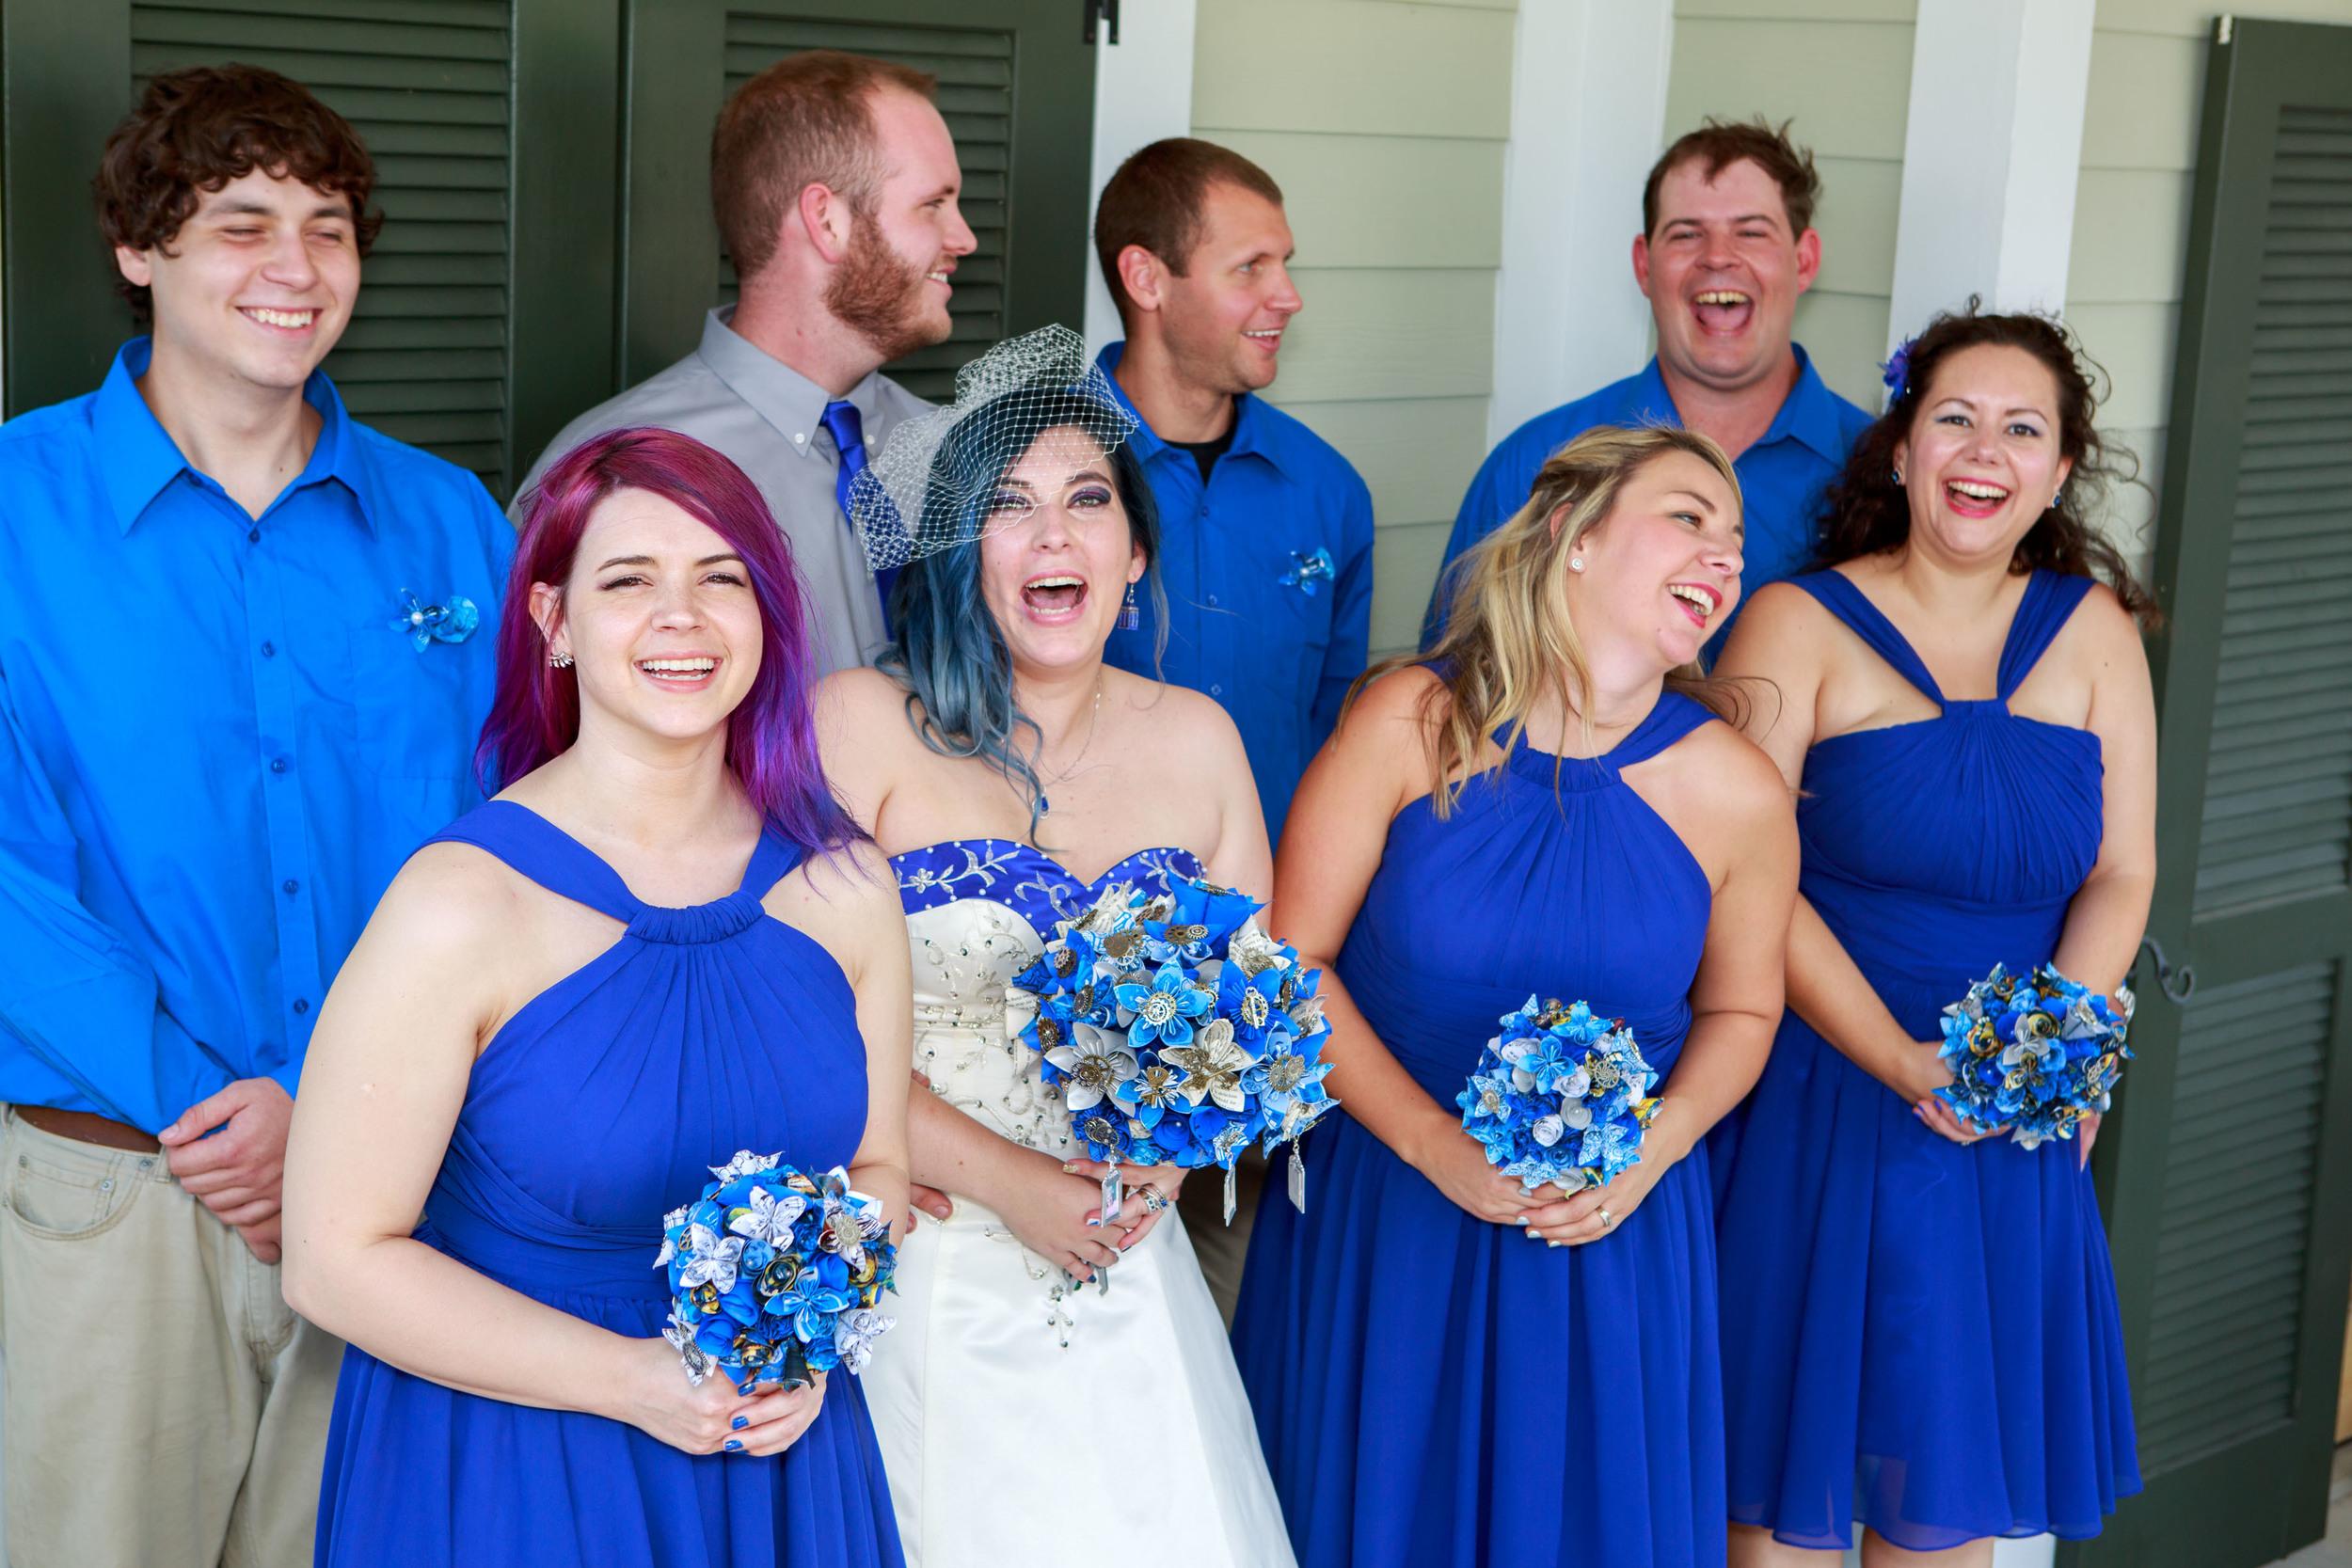 NC_Wedding_Photographer_Tiffany_Abruzzo_Family_Portraits_49.jpg